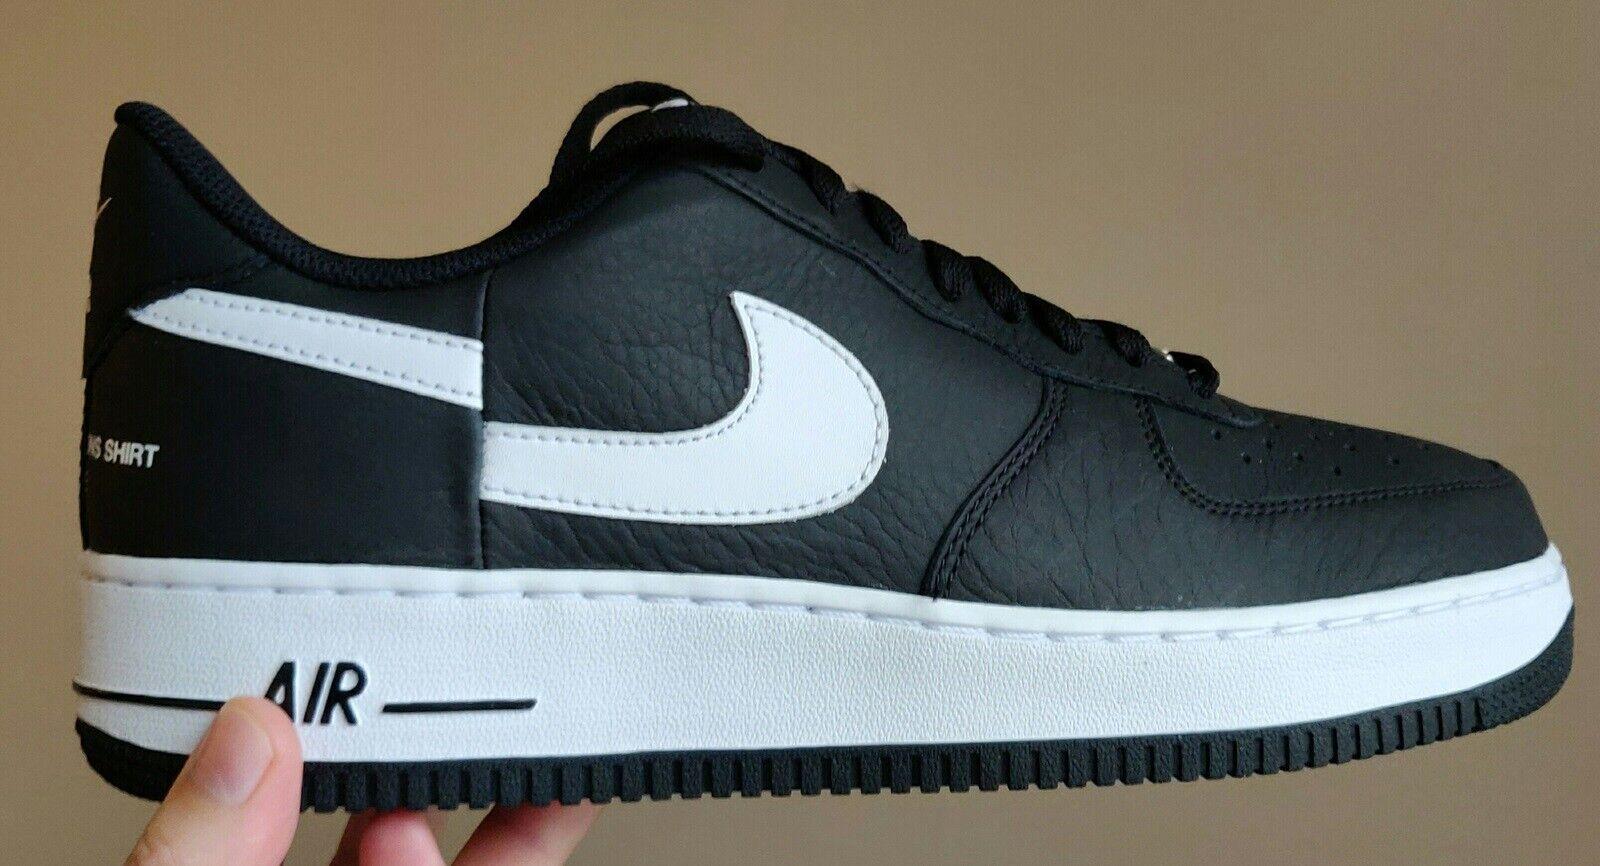 Sneakers, Supreme Nike air force 1,